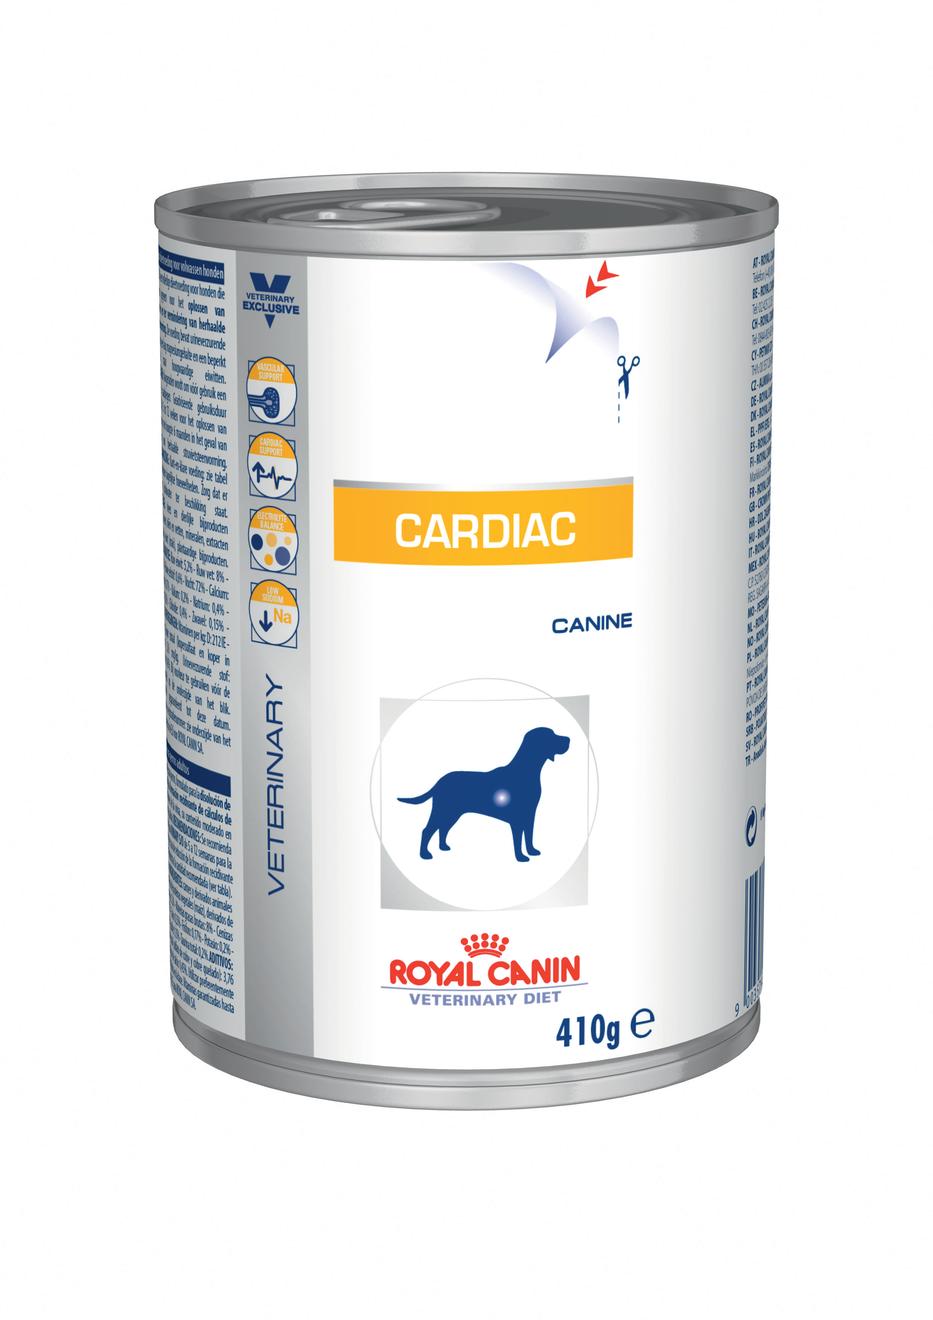 Royal Canin Veterinary Diet Dog CARDIAC konzerva 410g